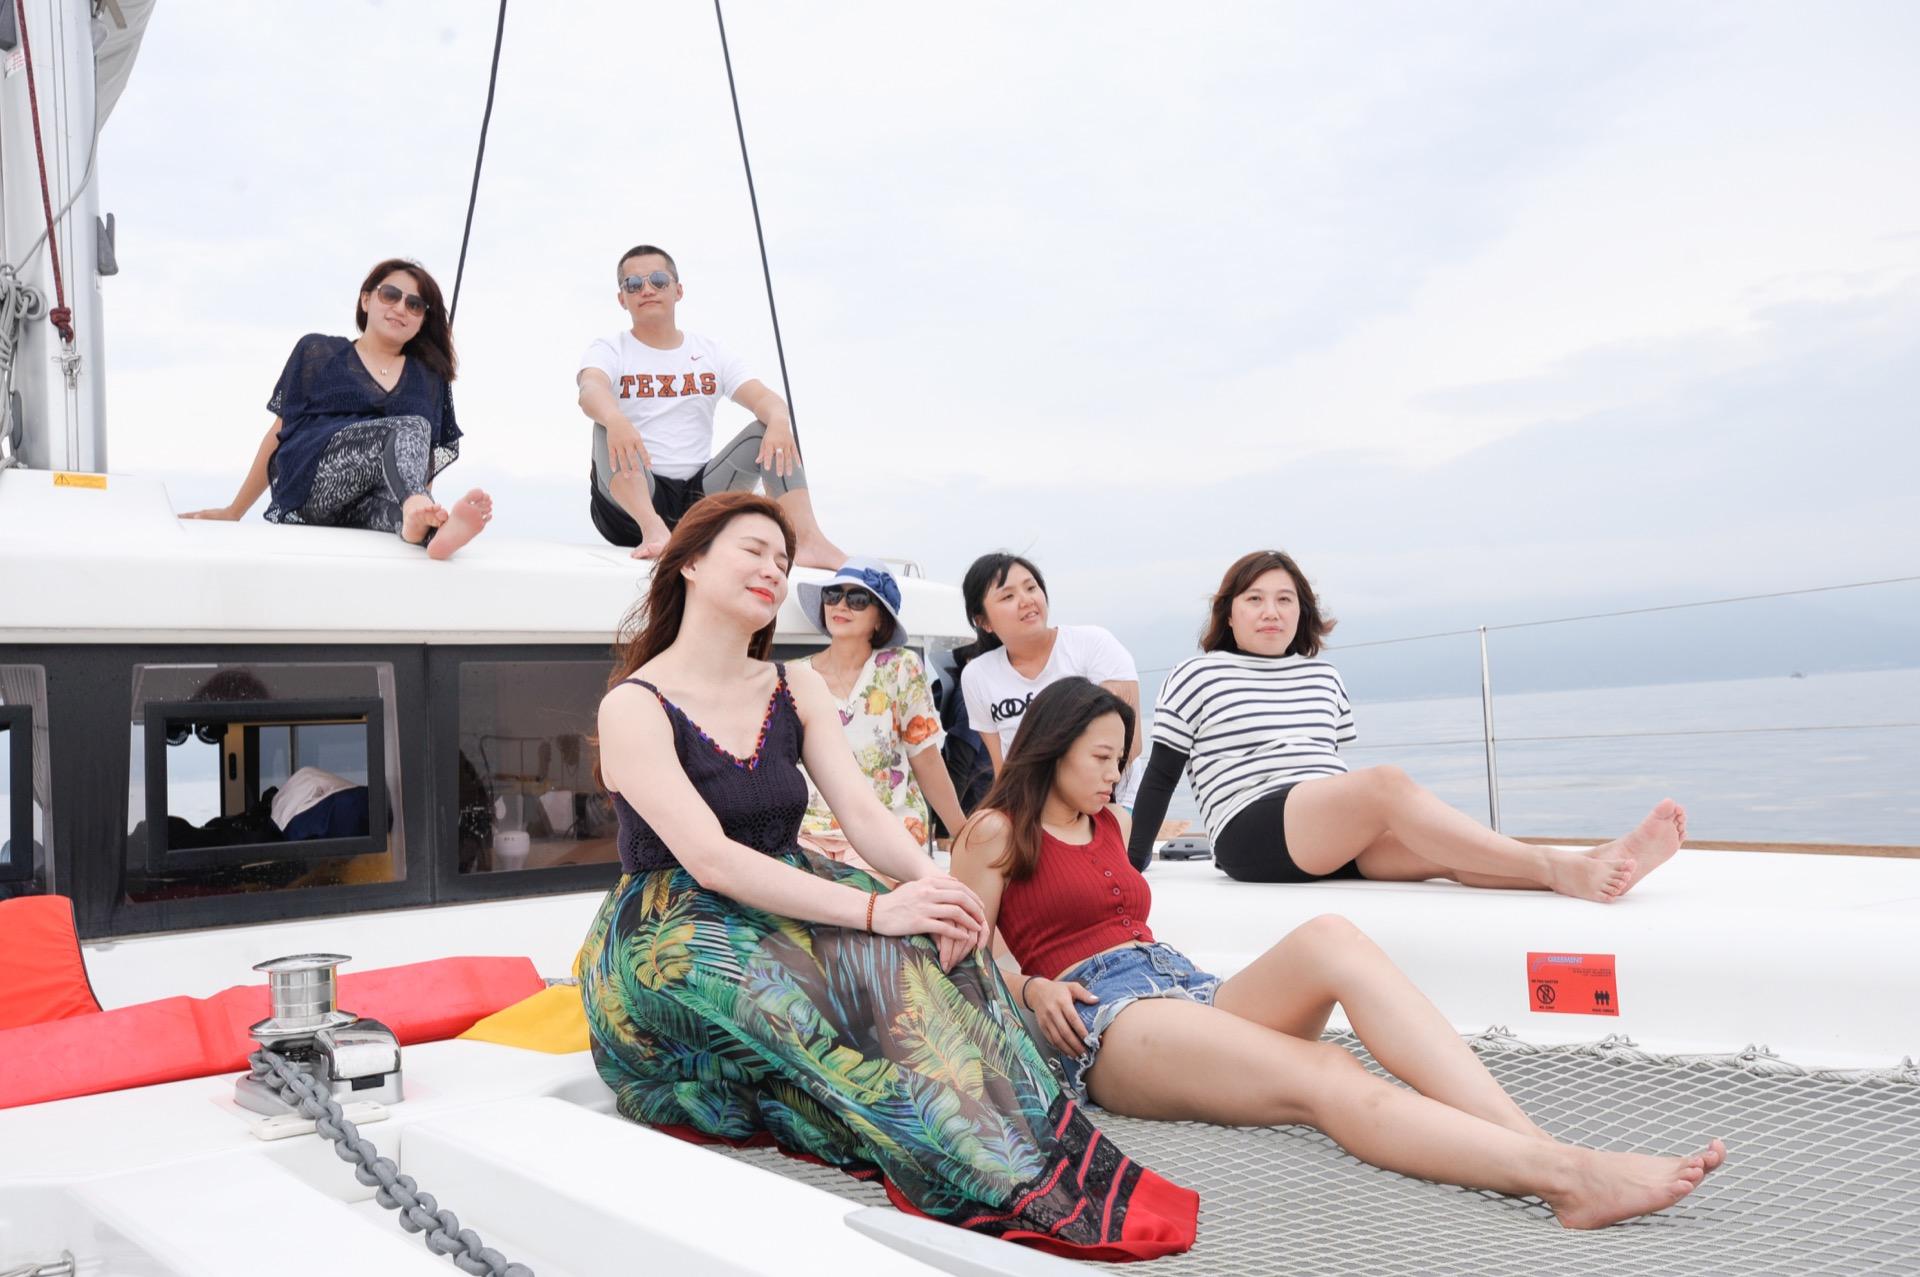 德築-DEZU-project-Fun3sport-lagoon-sailboat-ocean-9